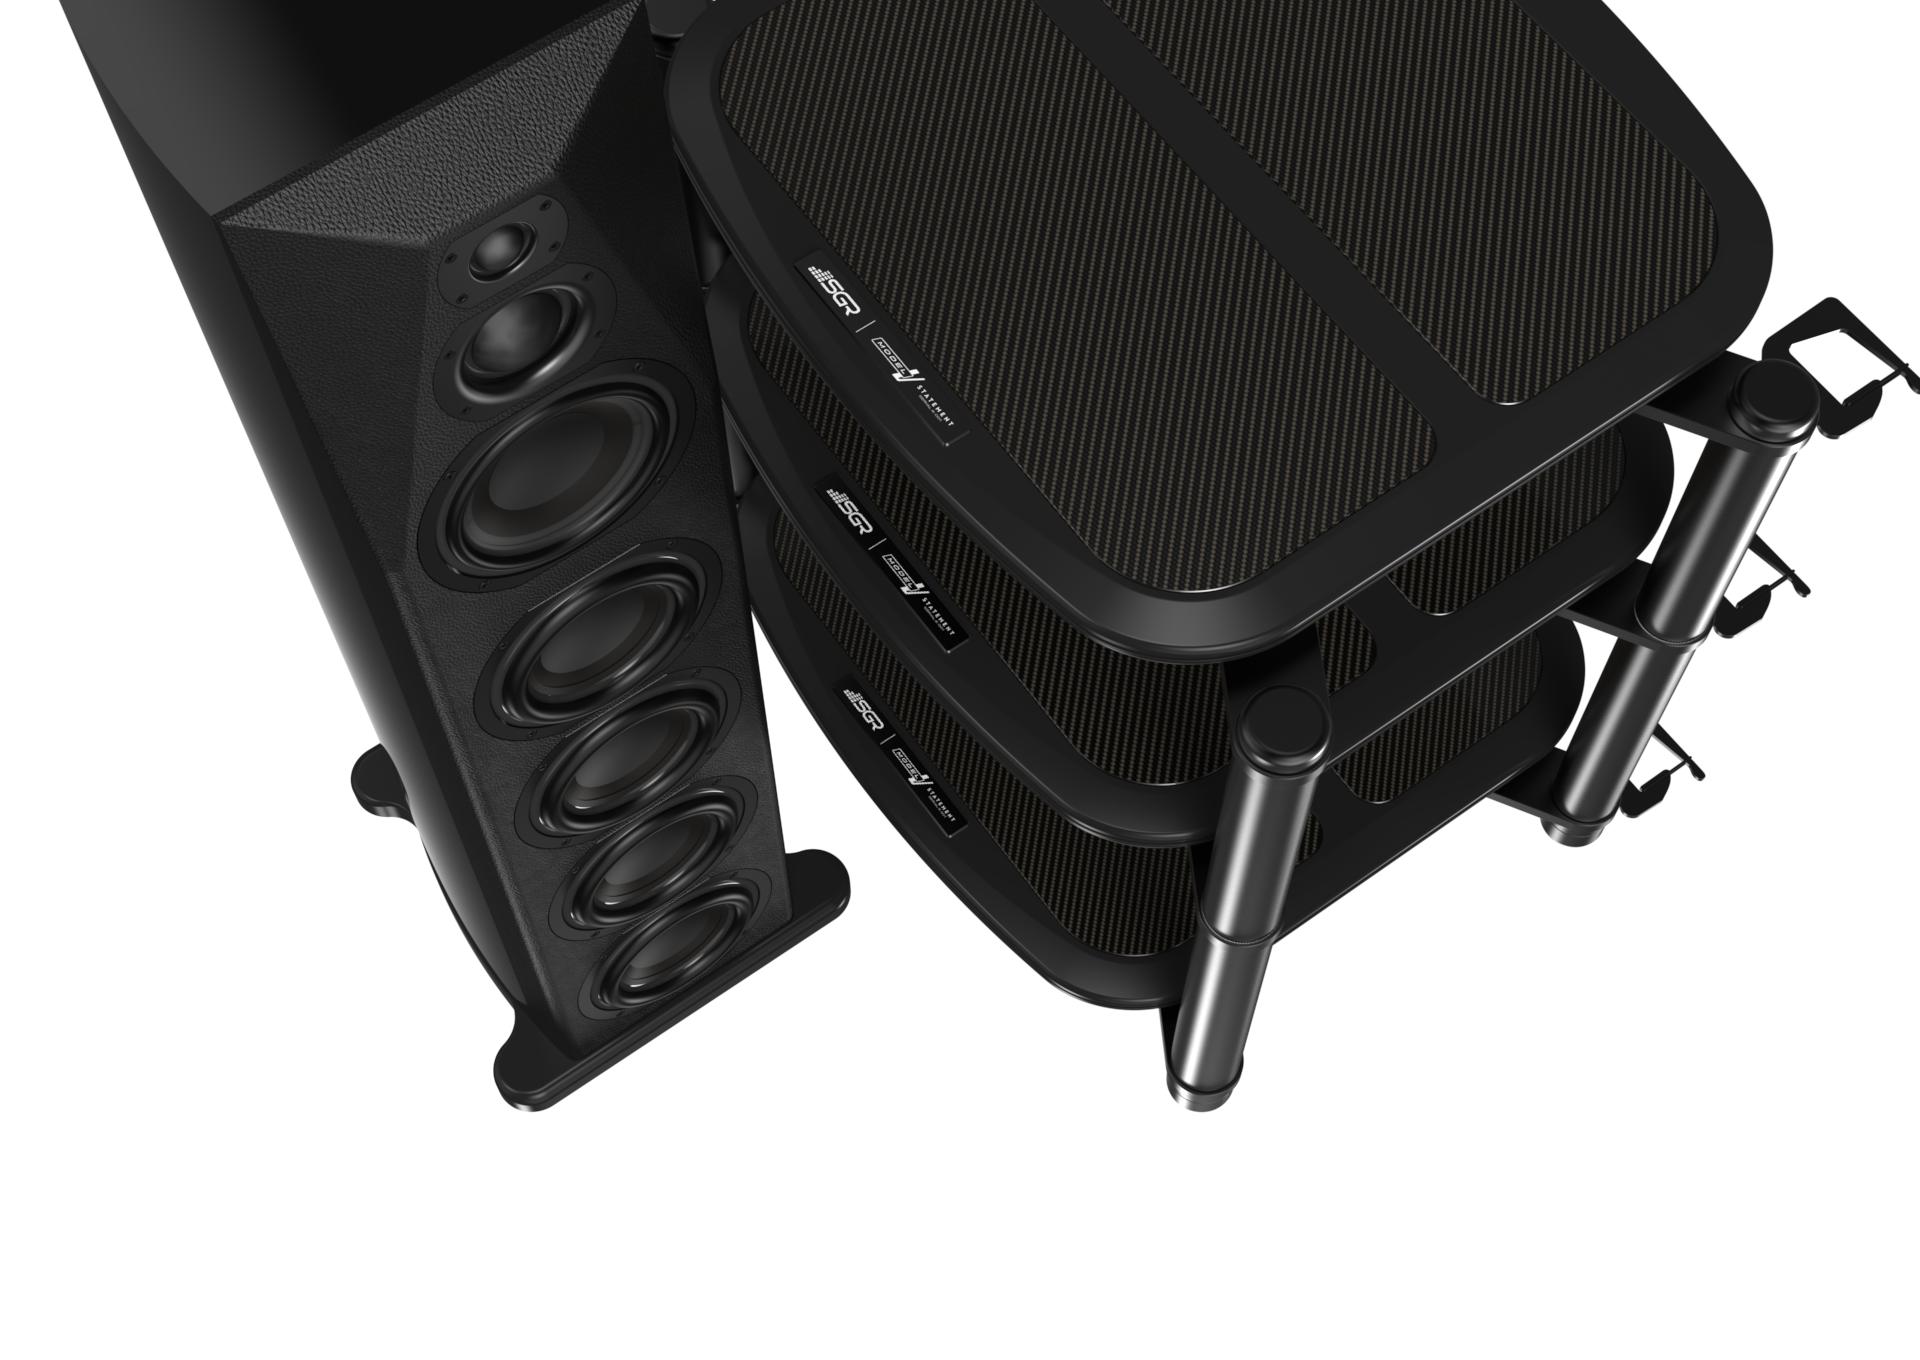 SGR Audio CX4F loudspeaker and Model V Statement hifi rack